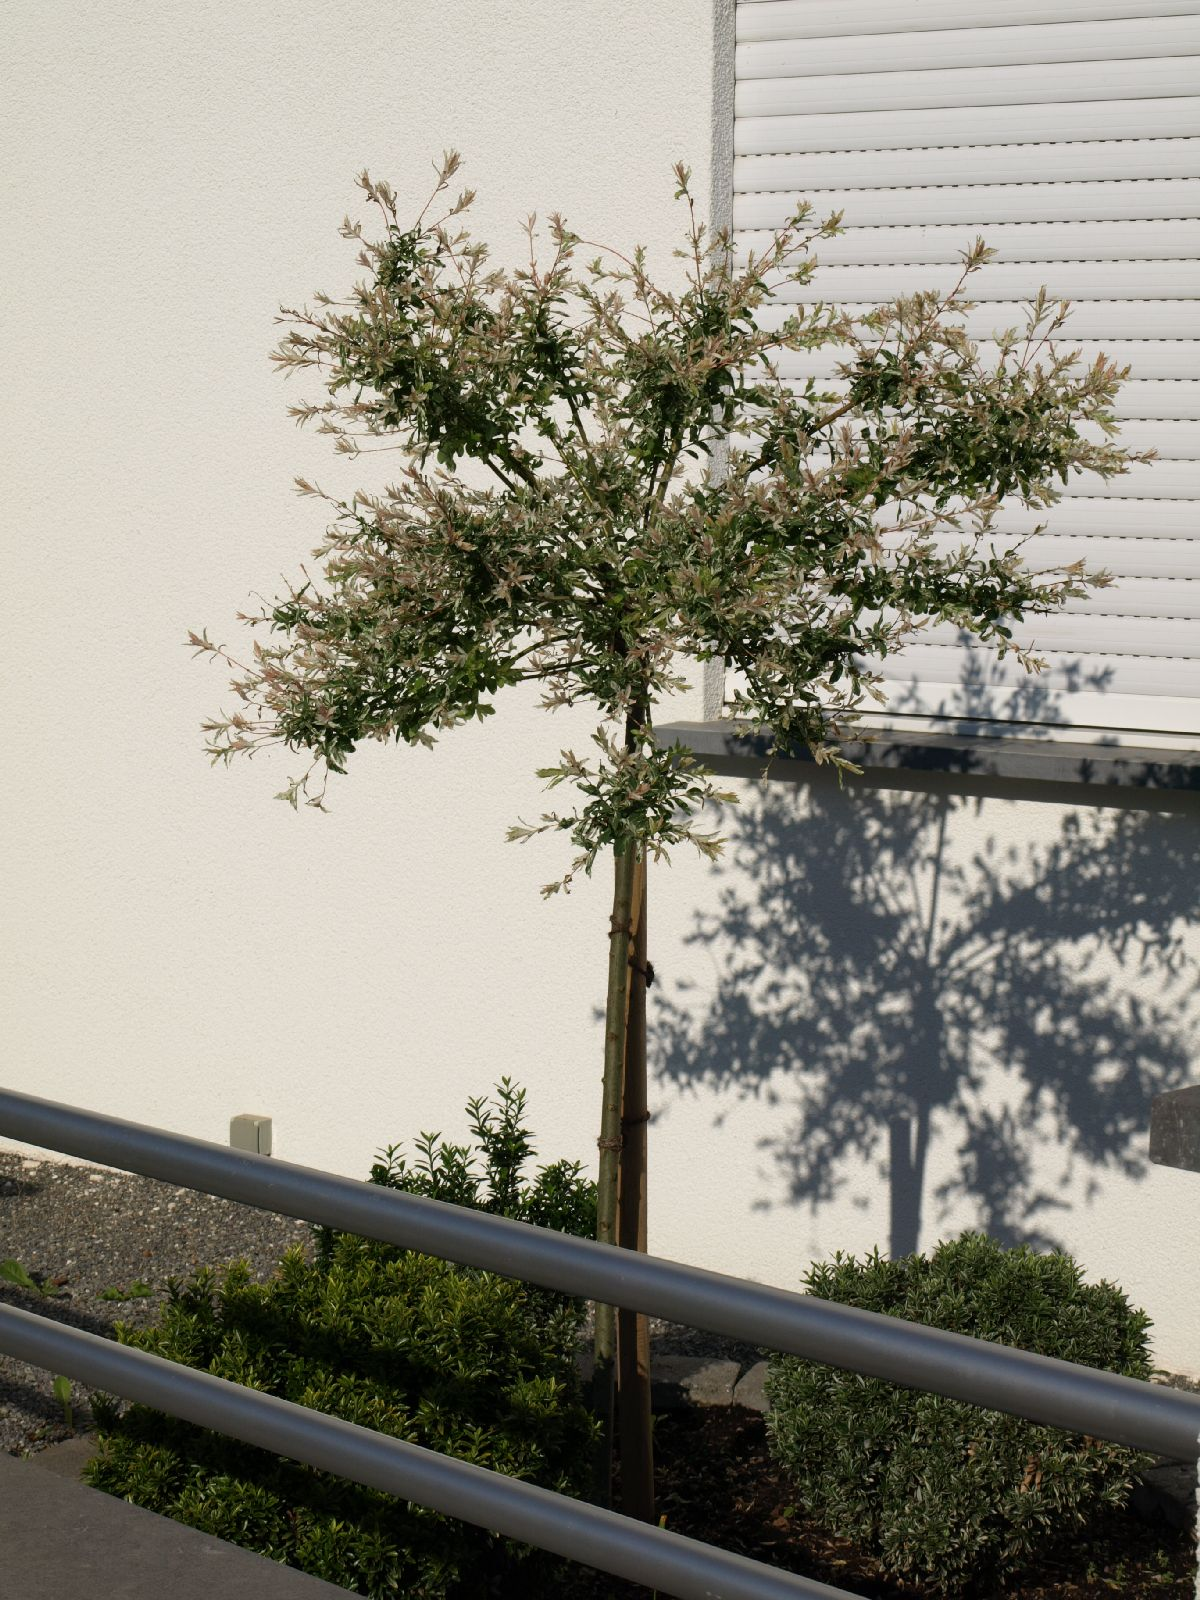 Plants-Trees_Photo_Texture_B_P6153456